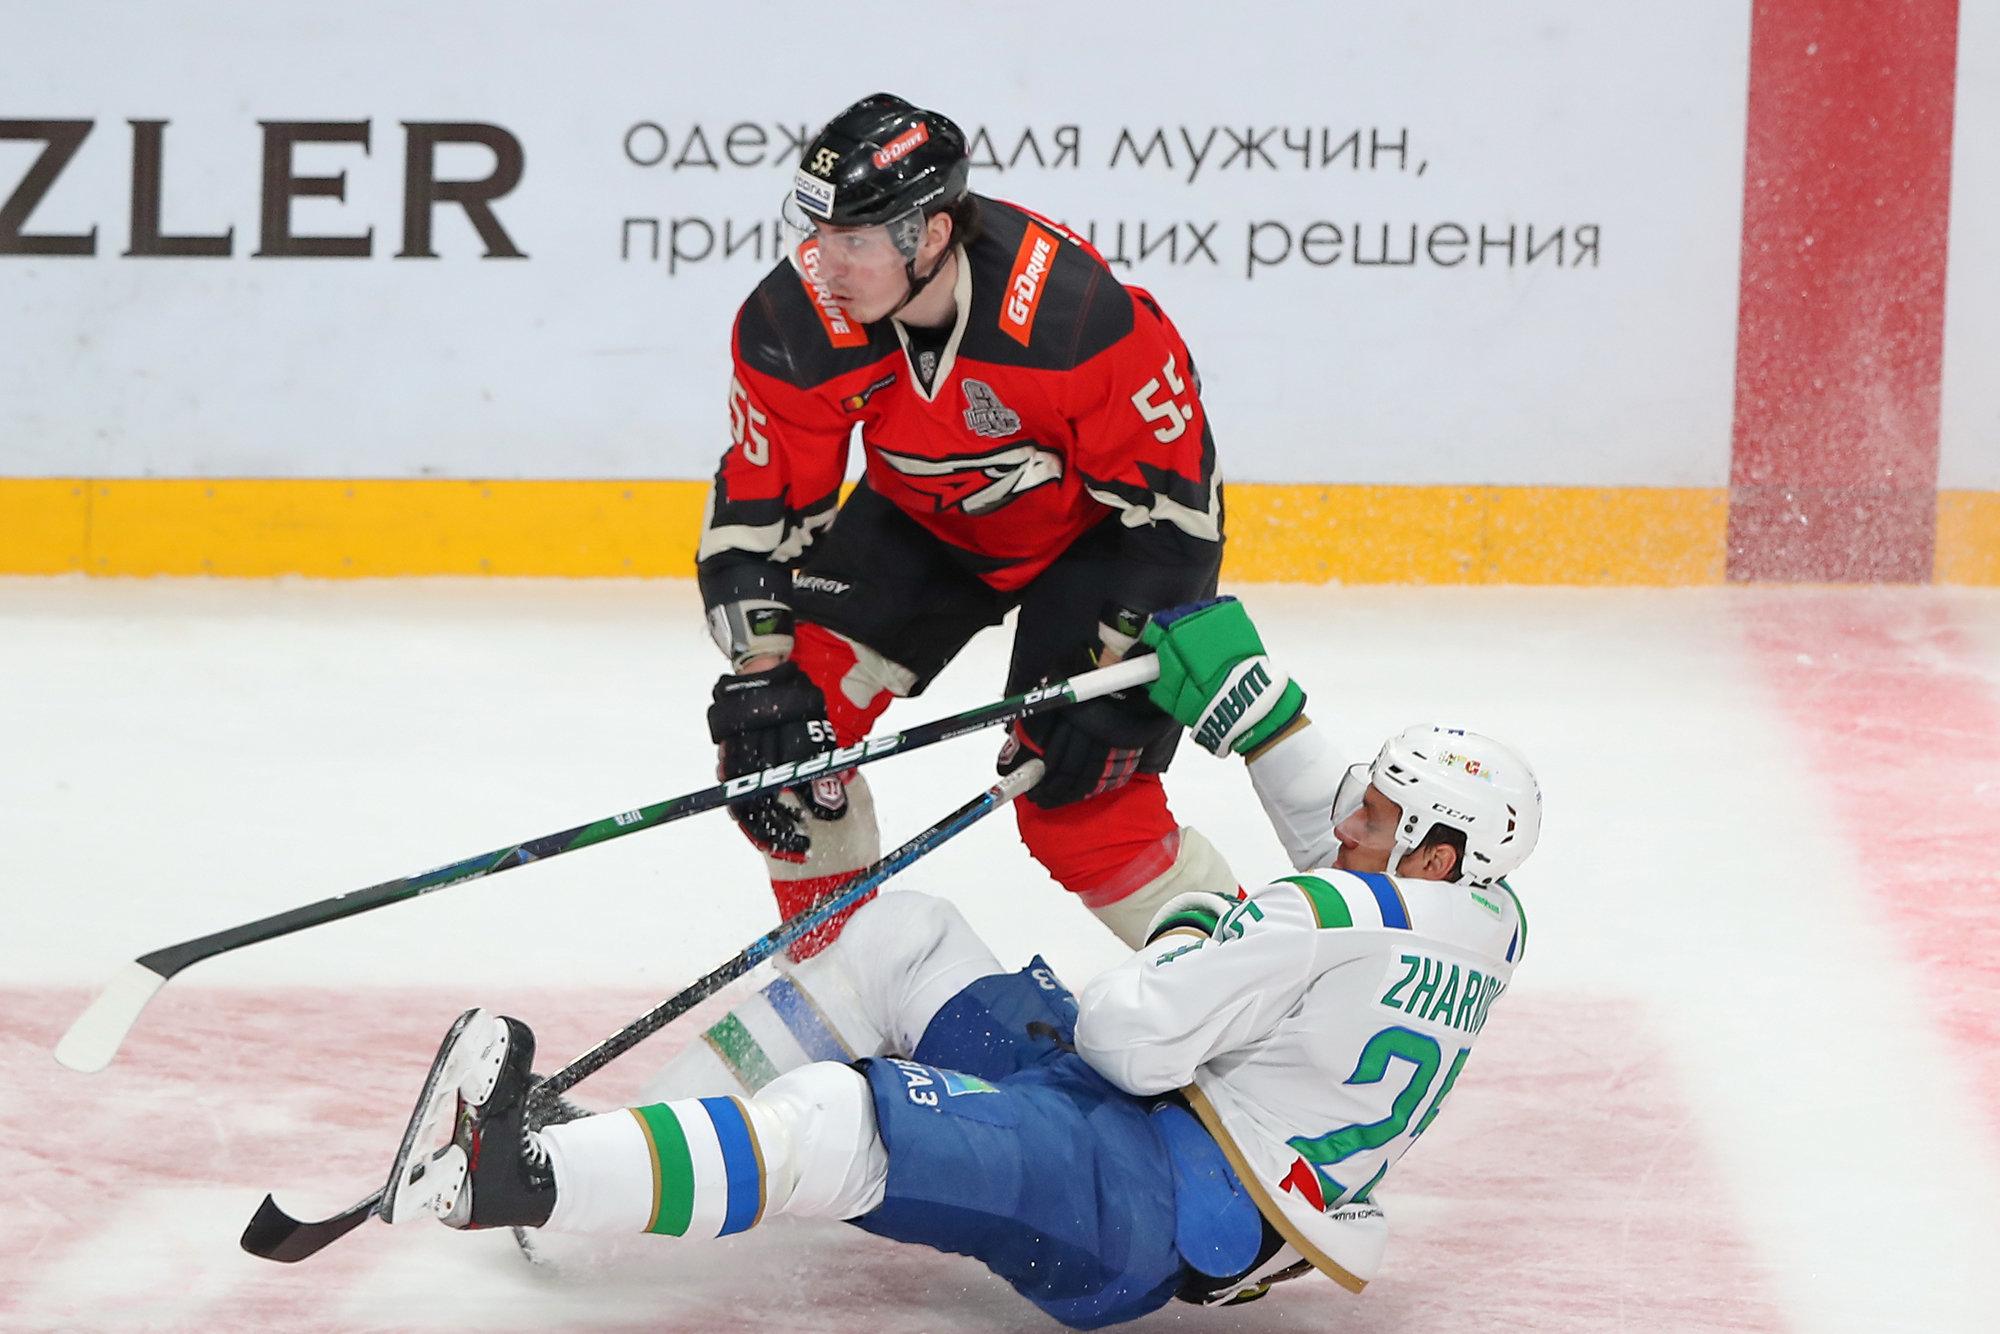 КХЛ зарегистрировала переход Мартынова из «Авангарда» в «Металлург»